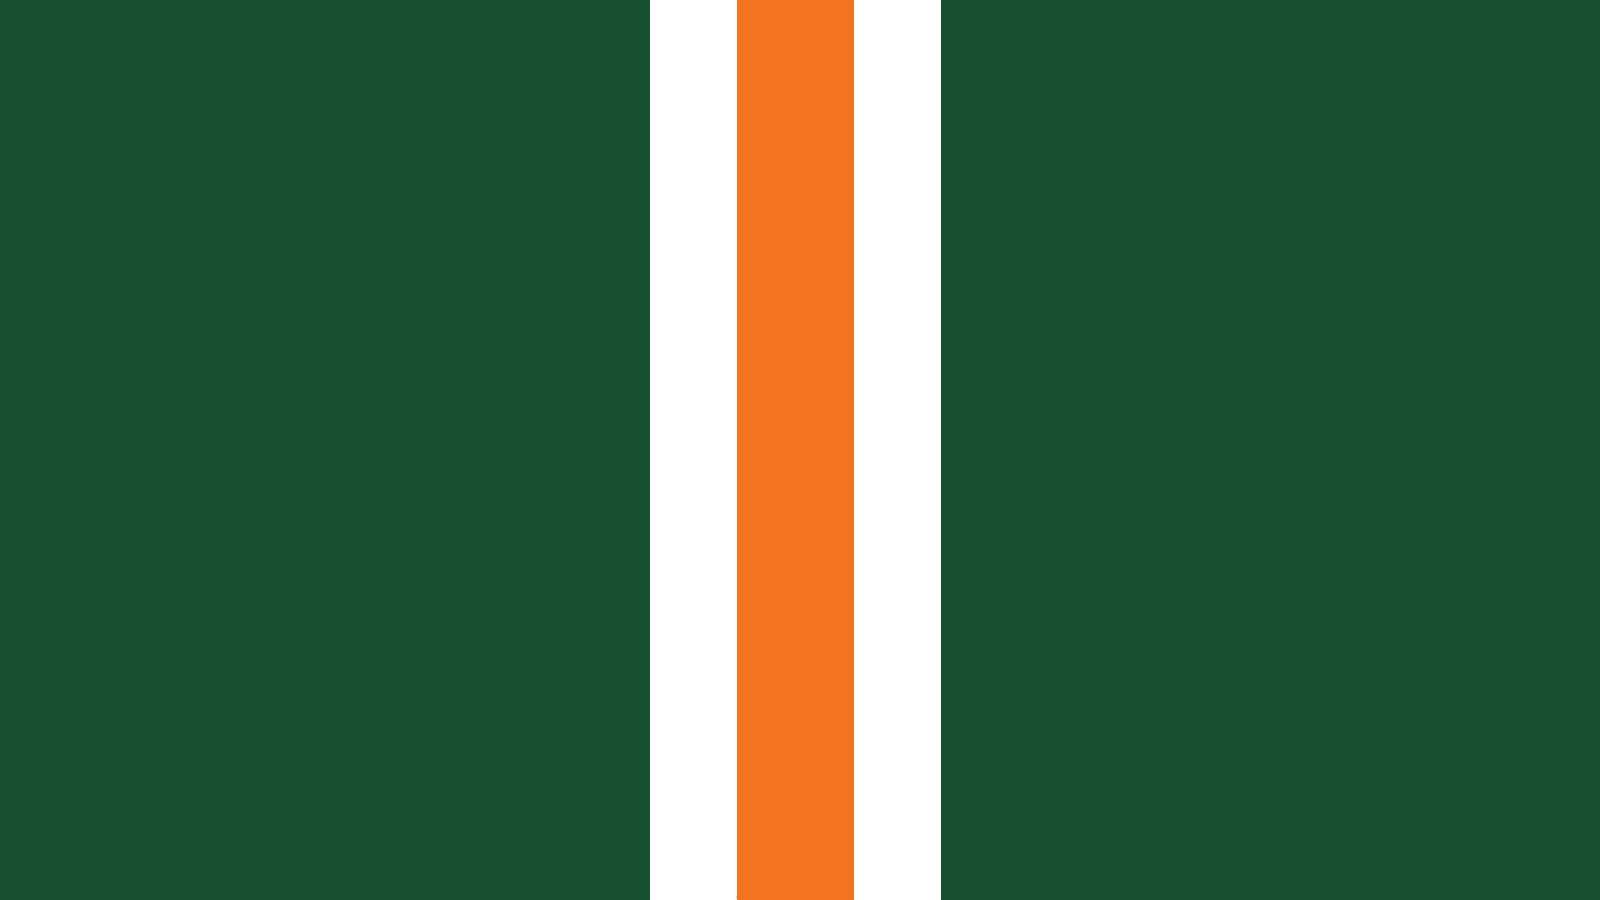 North Carolina Tar Heels at Miami Hurricanes (Reduced Capacity, Social Distancing) (Rescheduled from 12/5)